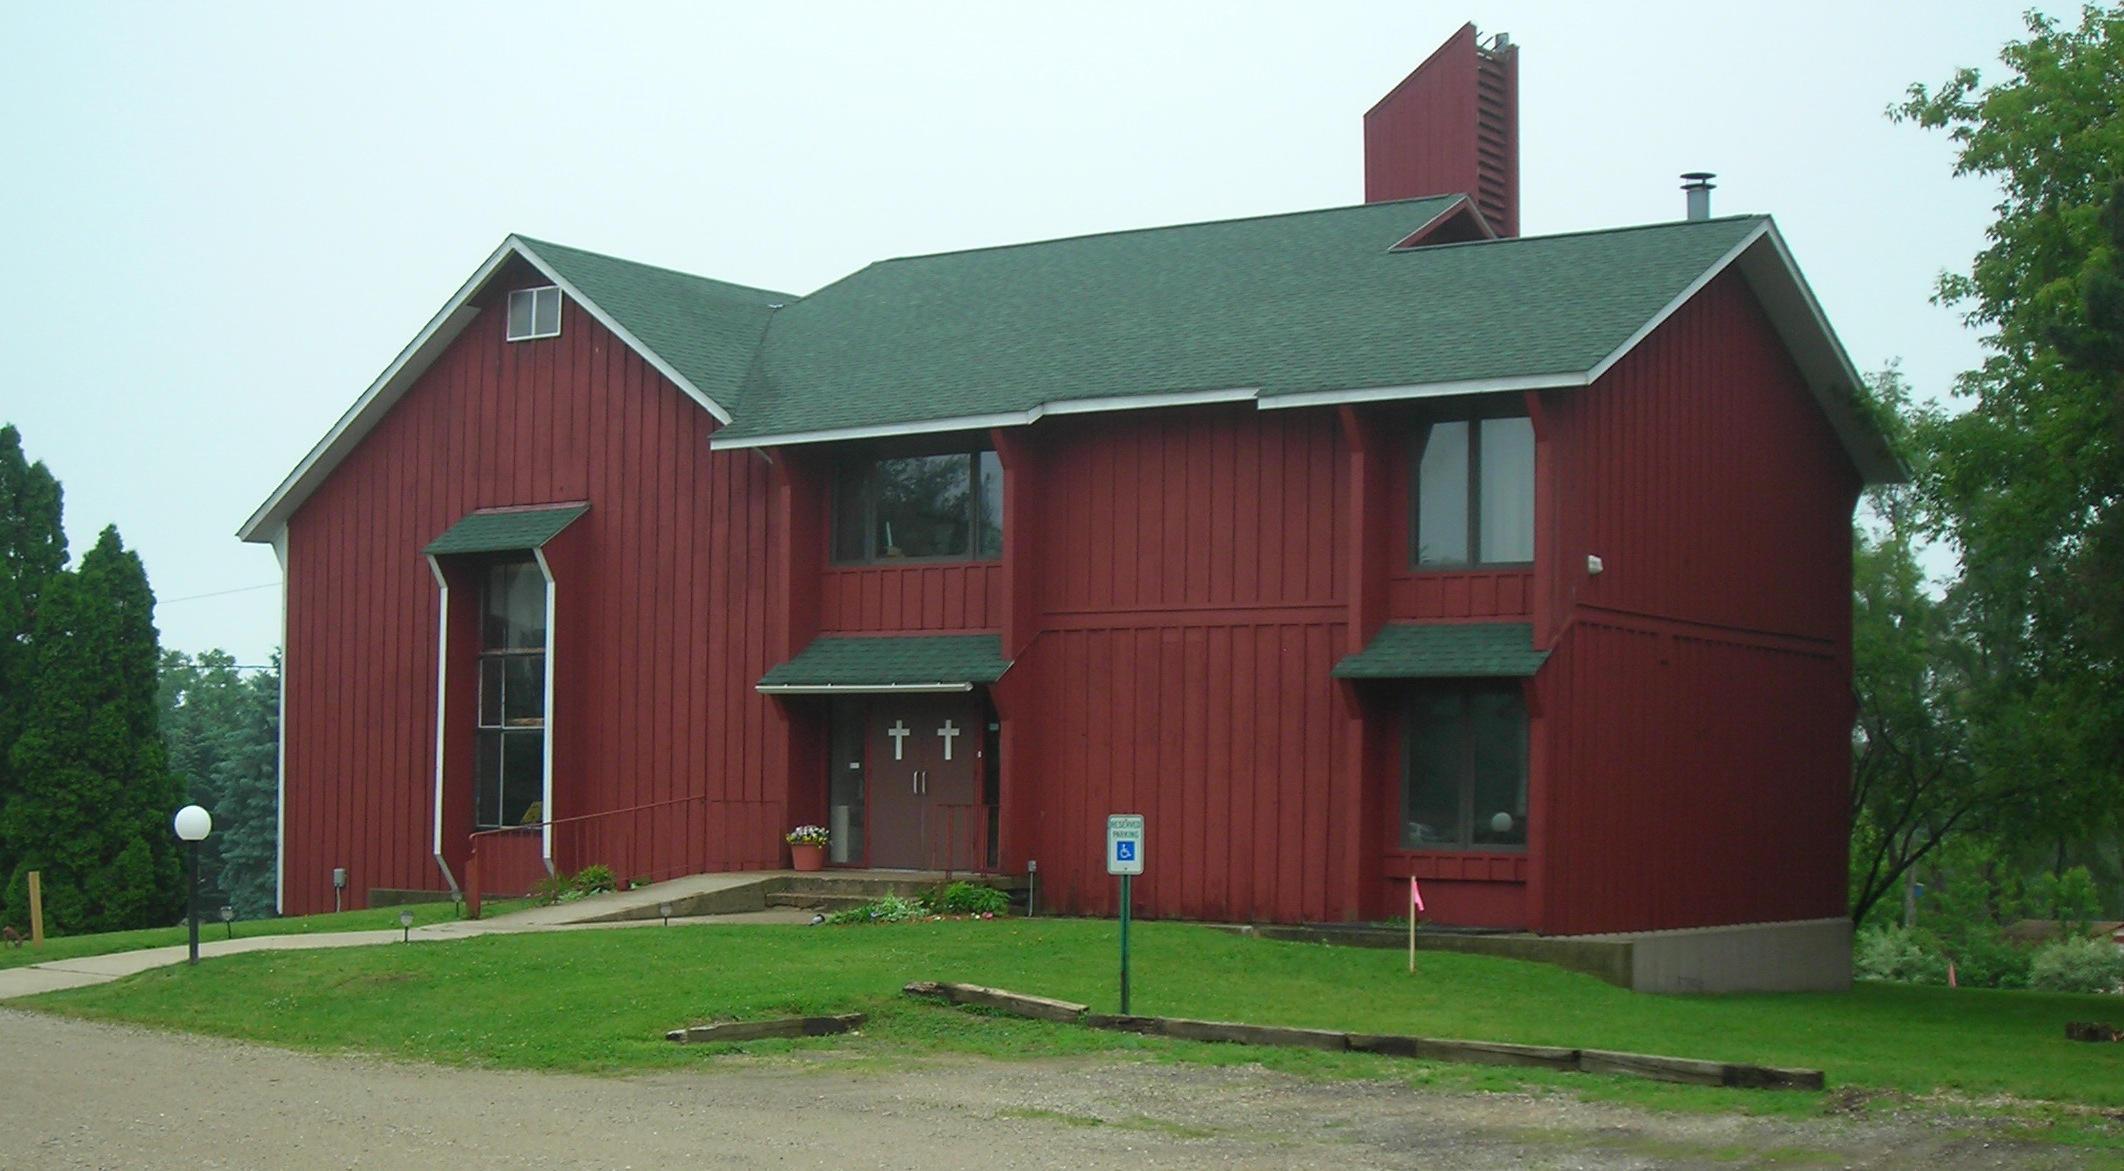 Meadowland Community Church image 2